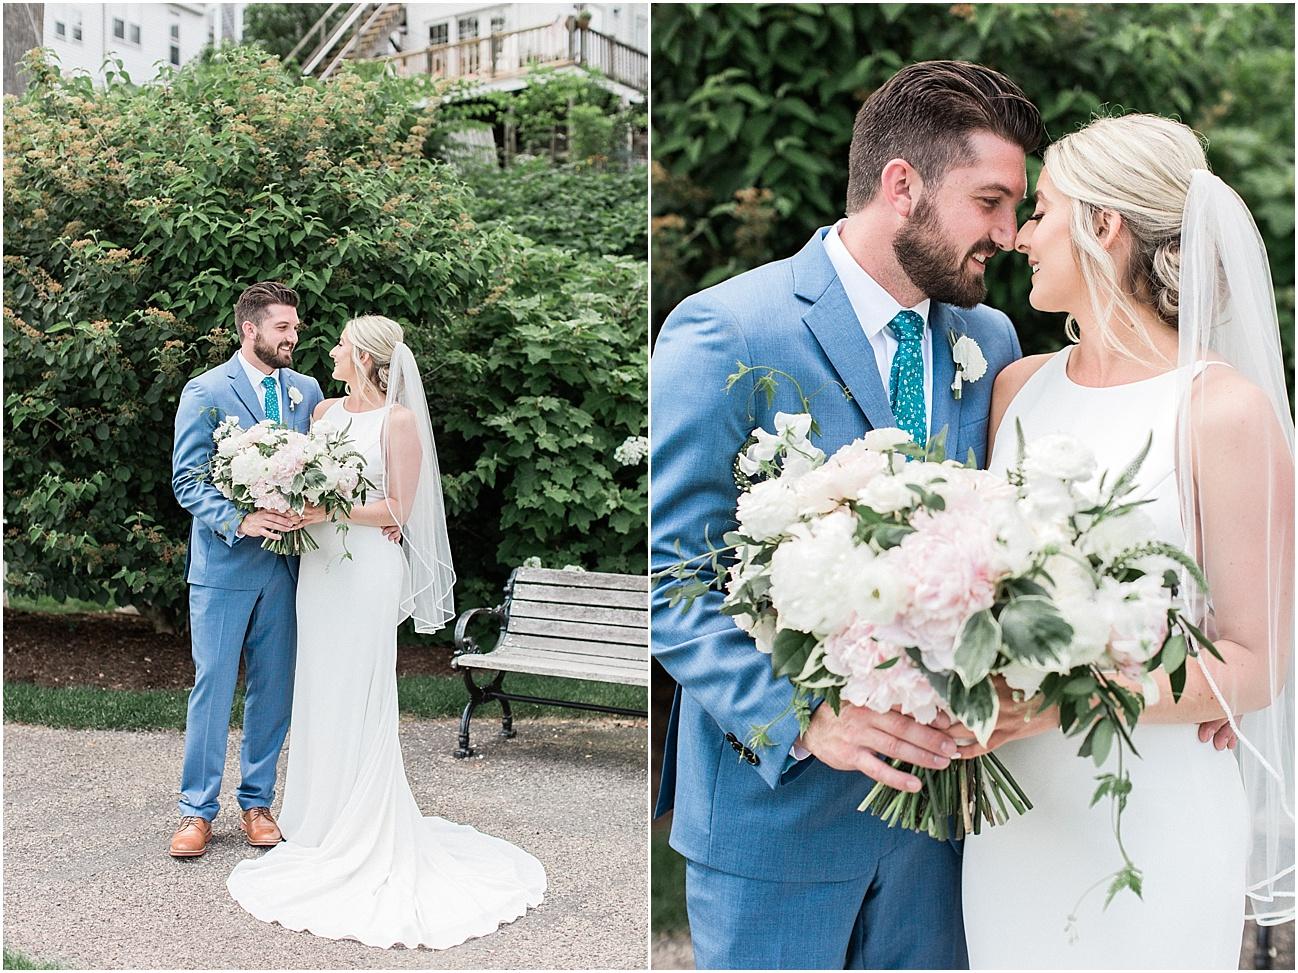 lindsey_paul_indian_pond_country_club_wild_dahlia_brewster_gardens_plymouth_cape_cod_boston_wedding_photographer_meredith_jane_photography_photo_0368.jpg